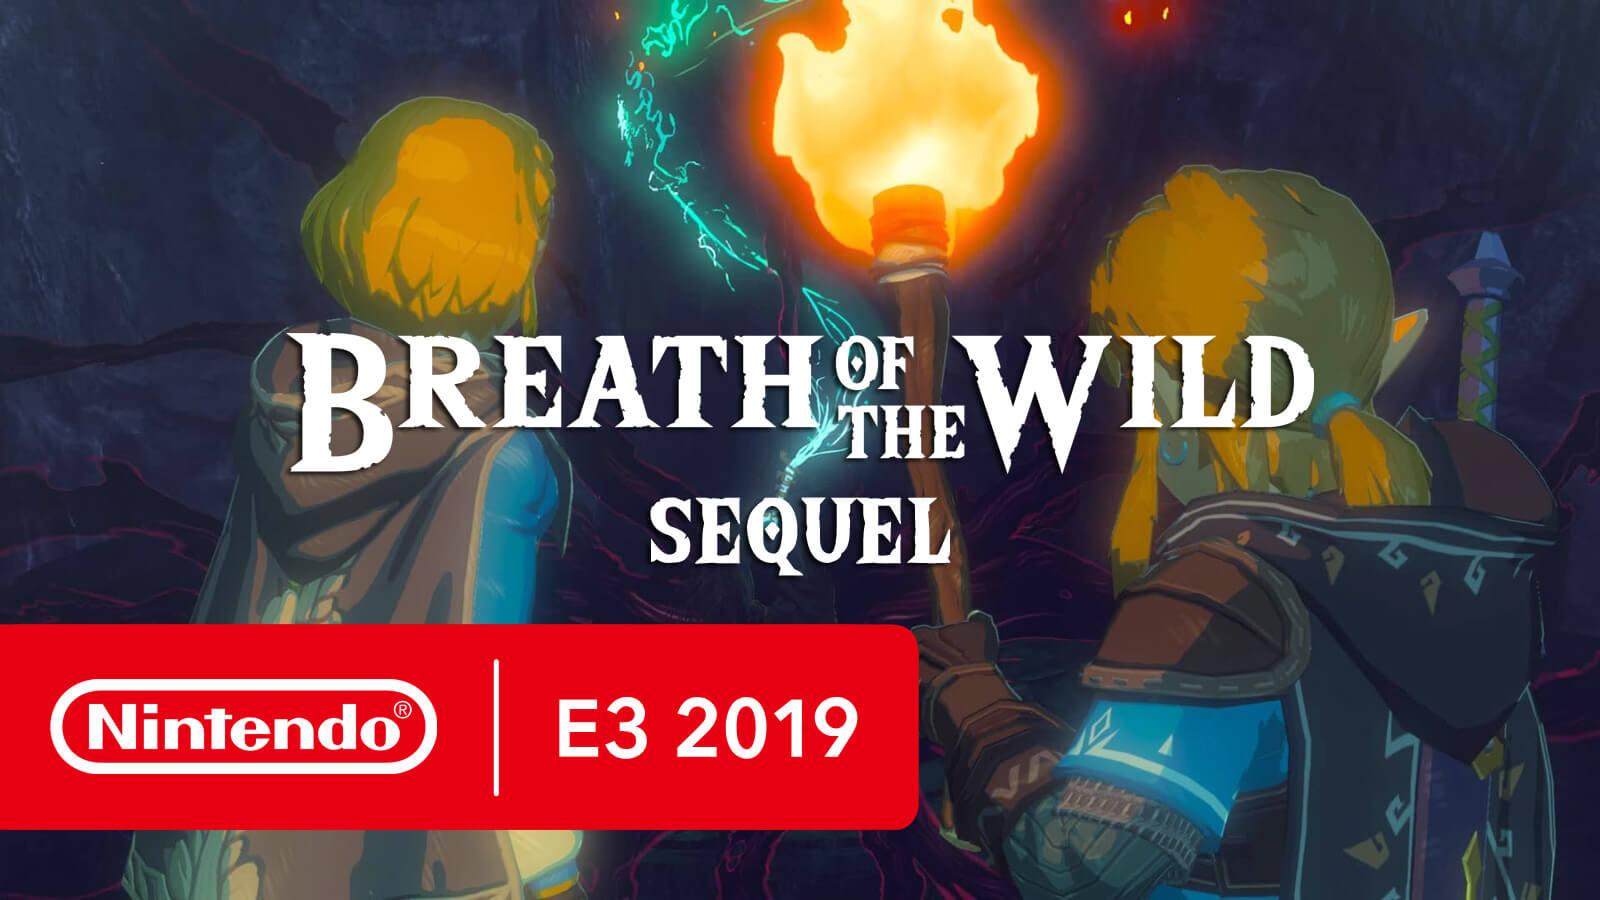 Legend of Zelda: Breath of the Wild Sequel Announced